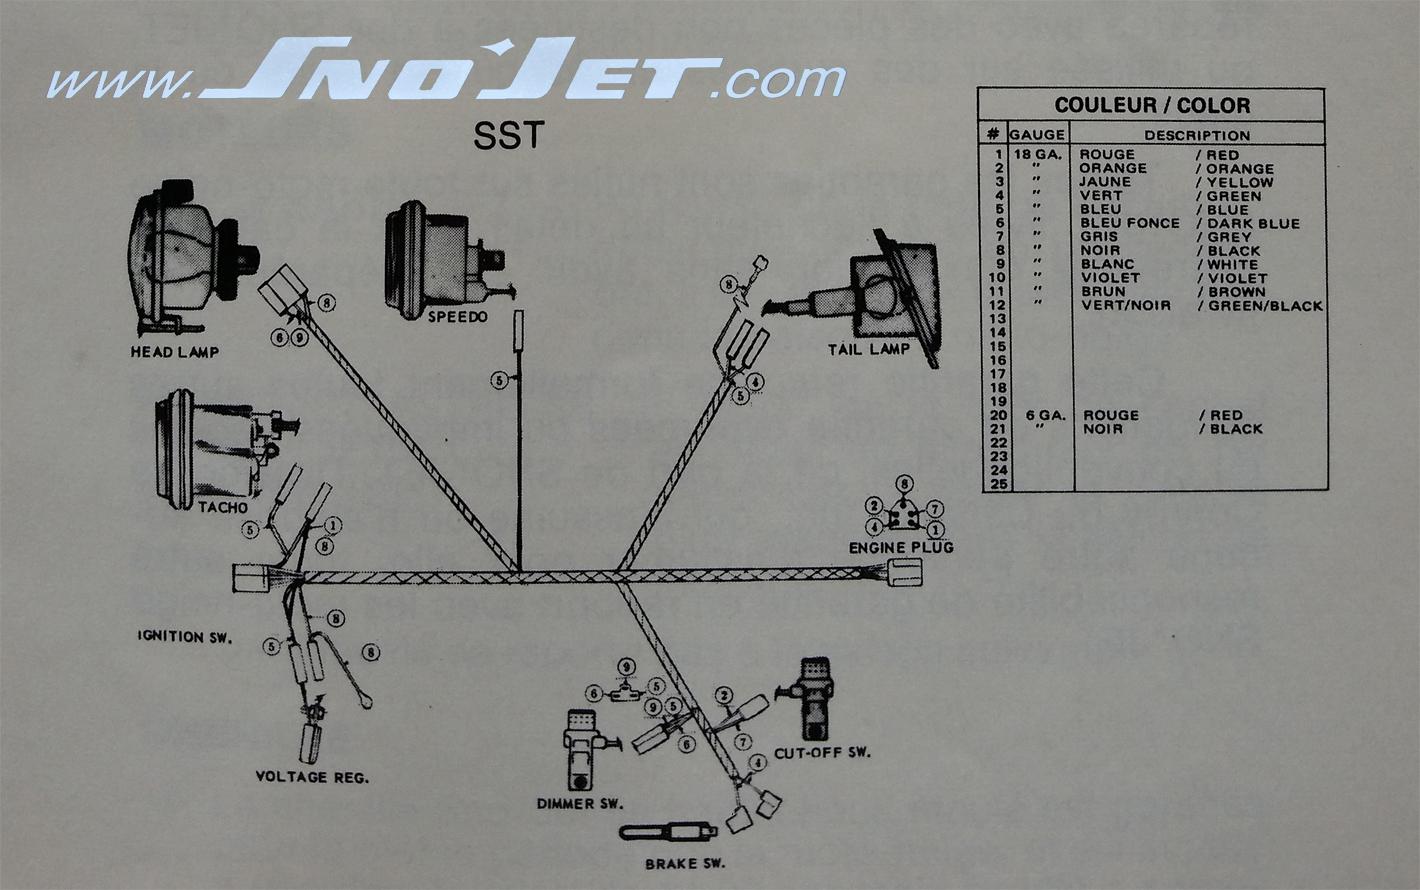 74SSTwd 1974 sno jet sst ( key switch wiring),Sst Wiring Diagram